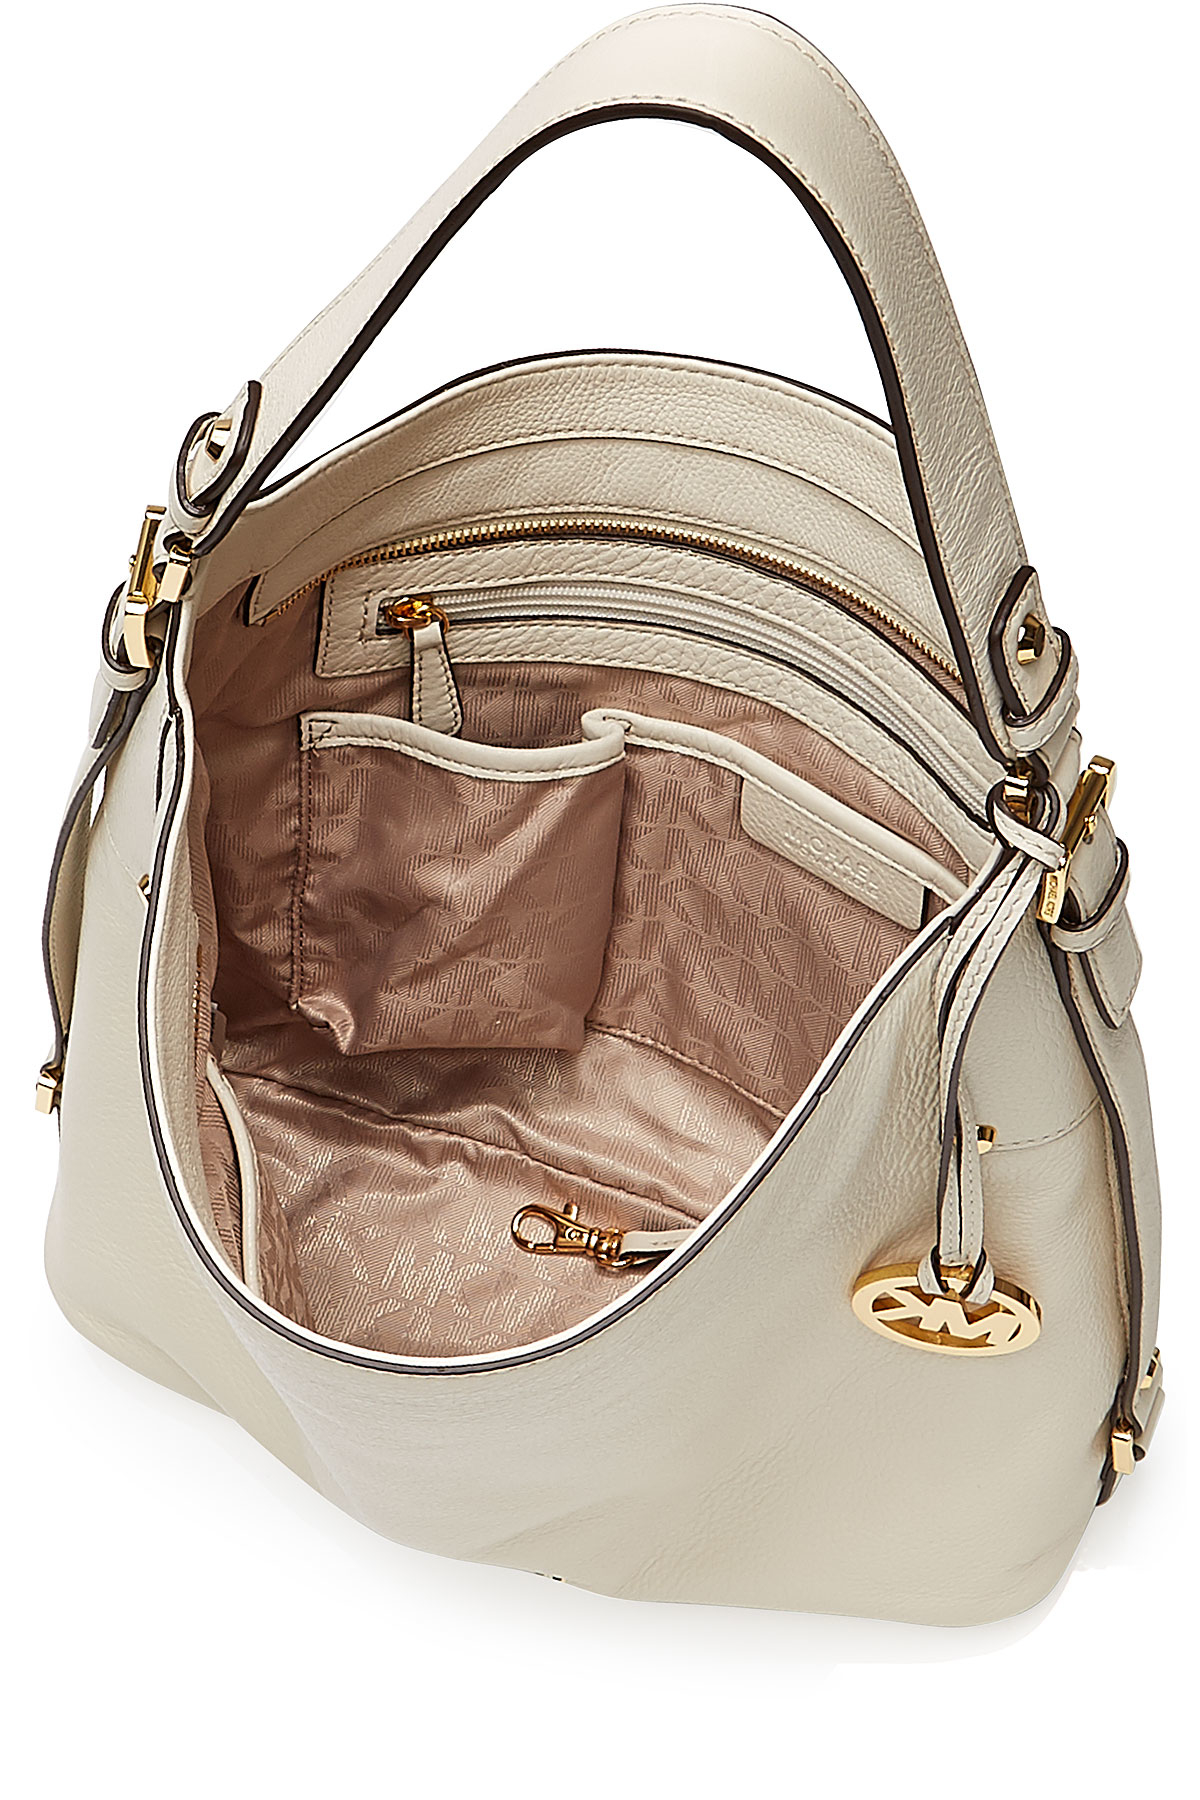 e7ae0bf71d081 Lyst - MICHAEL Michael Kors Bedford Large Leather Shoulder Bag ...